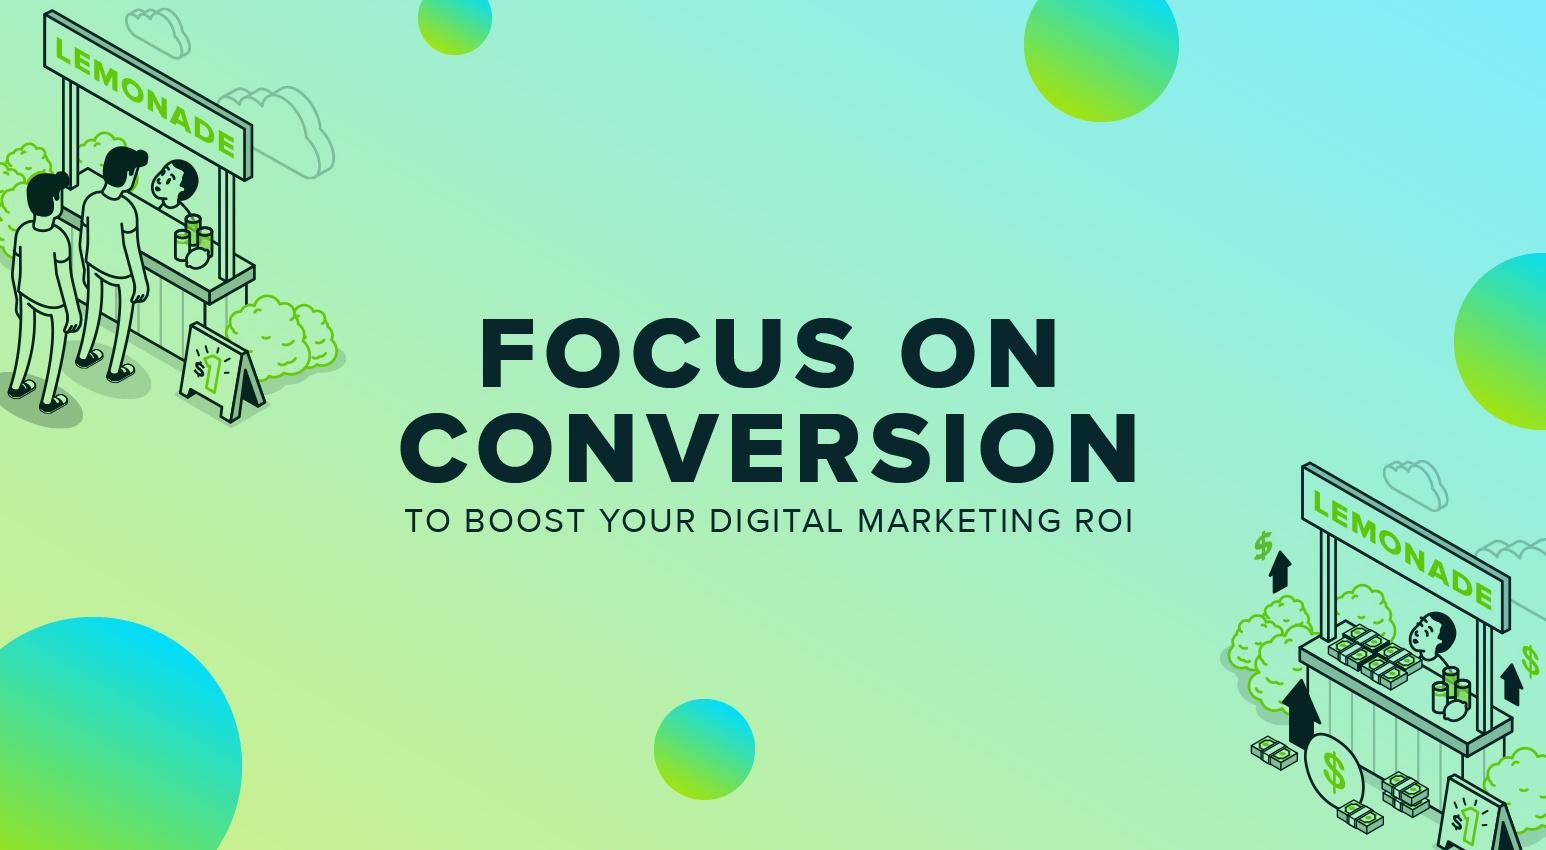 granify-conversion-focus-lemonade-sales-banner-graphic